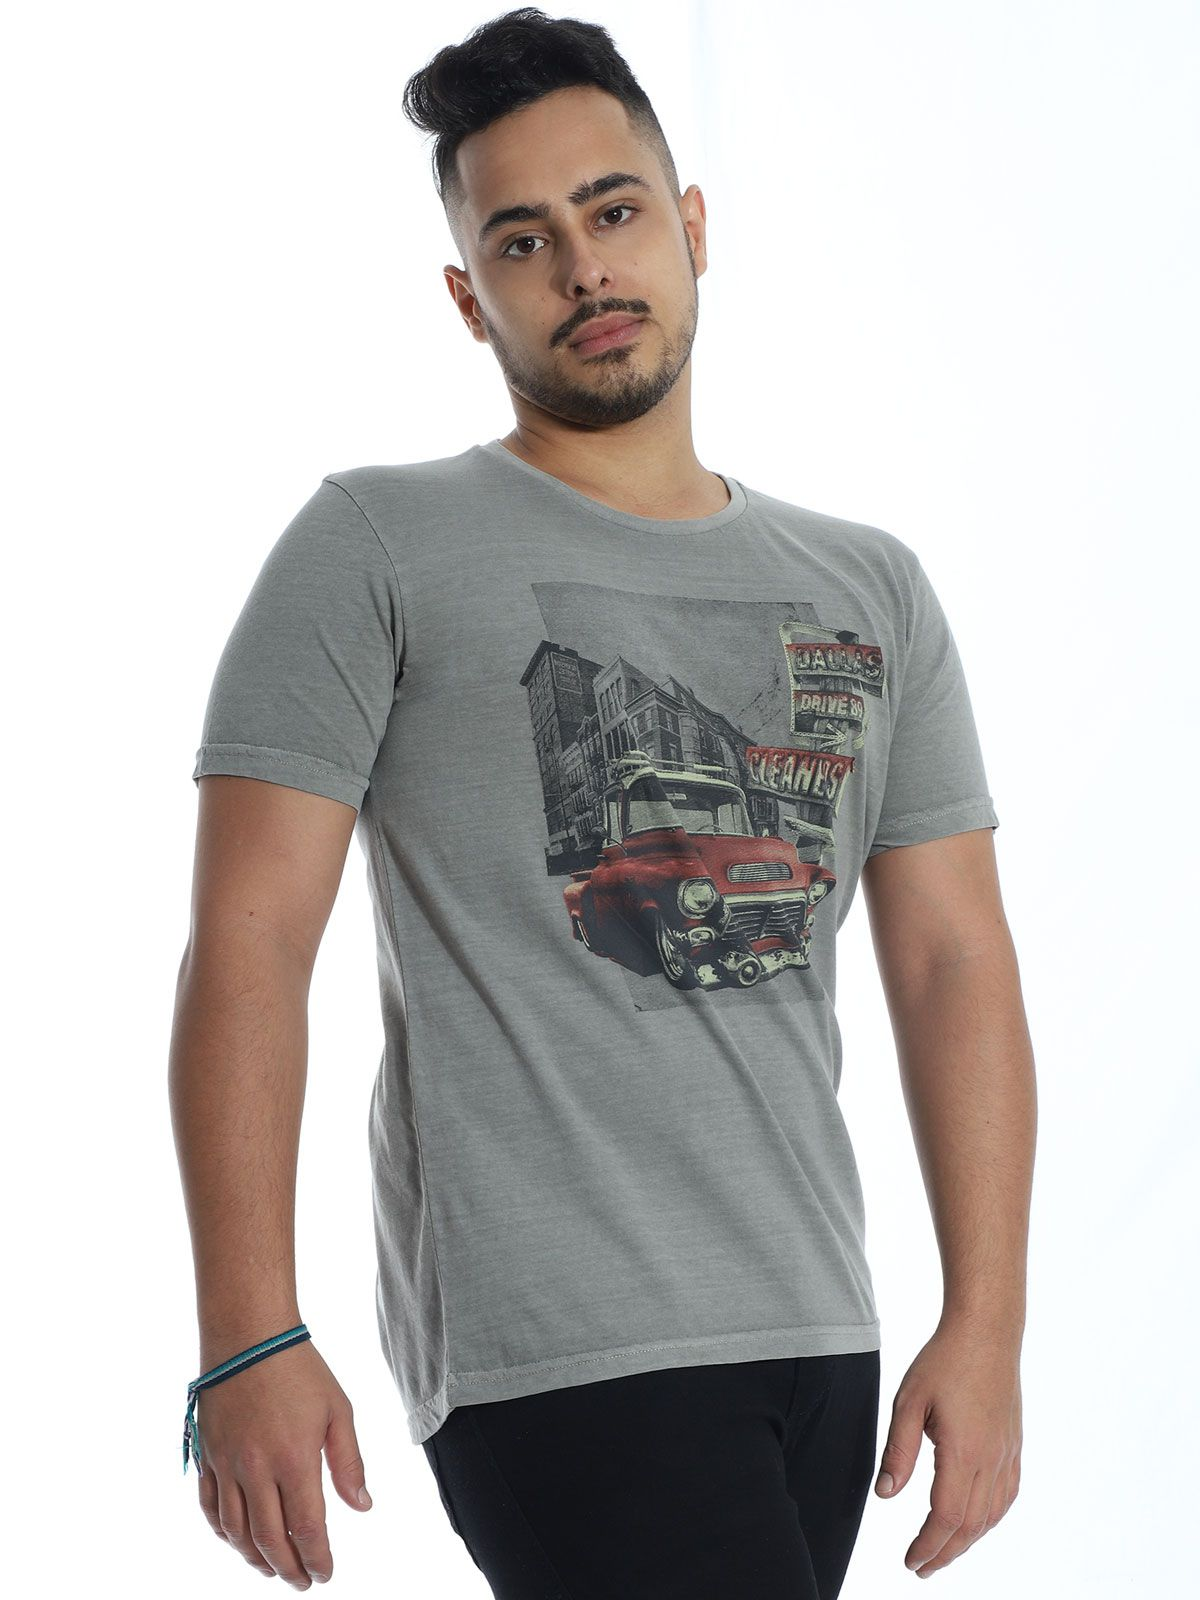 Camiseta Masculina Slim Fit Anistia Stonada Manga Curta  Cinza